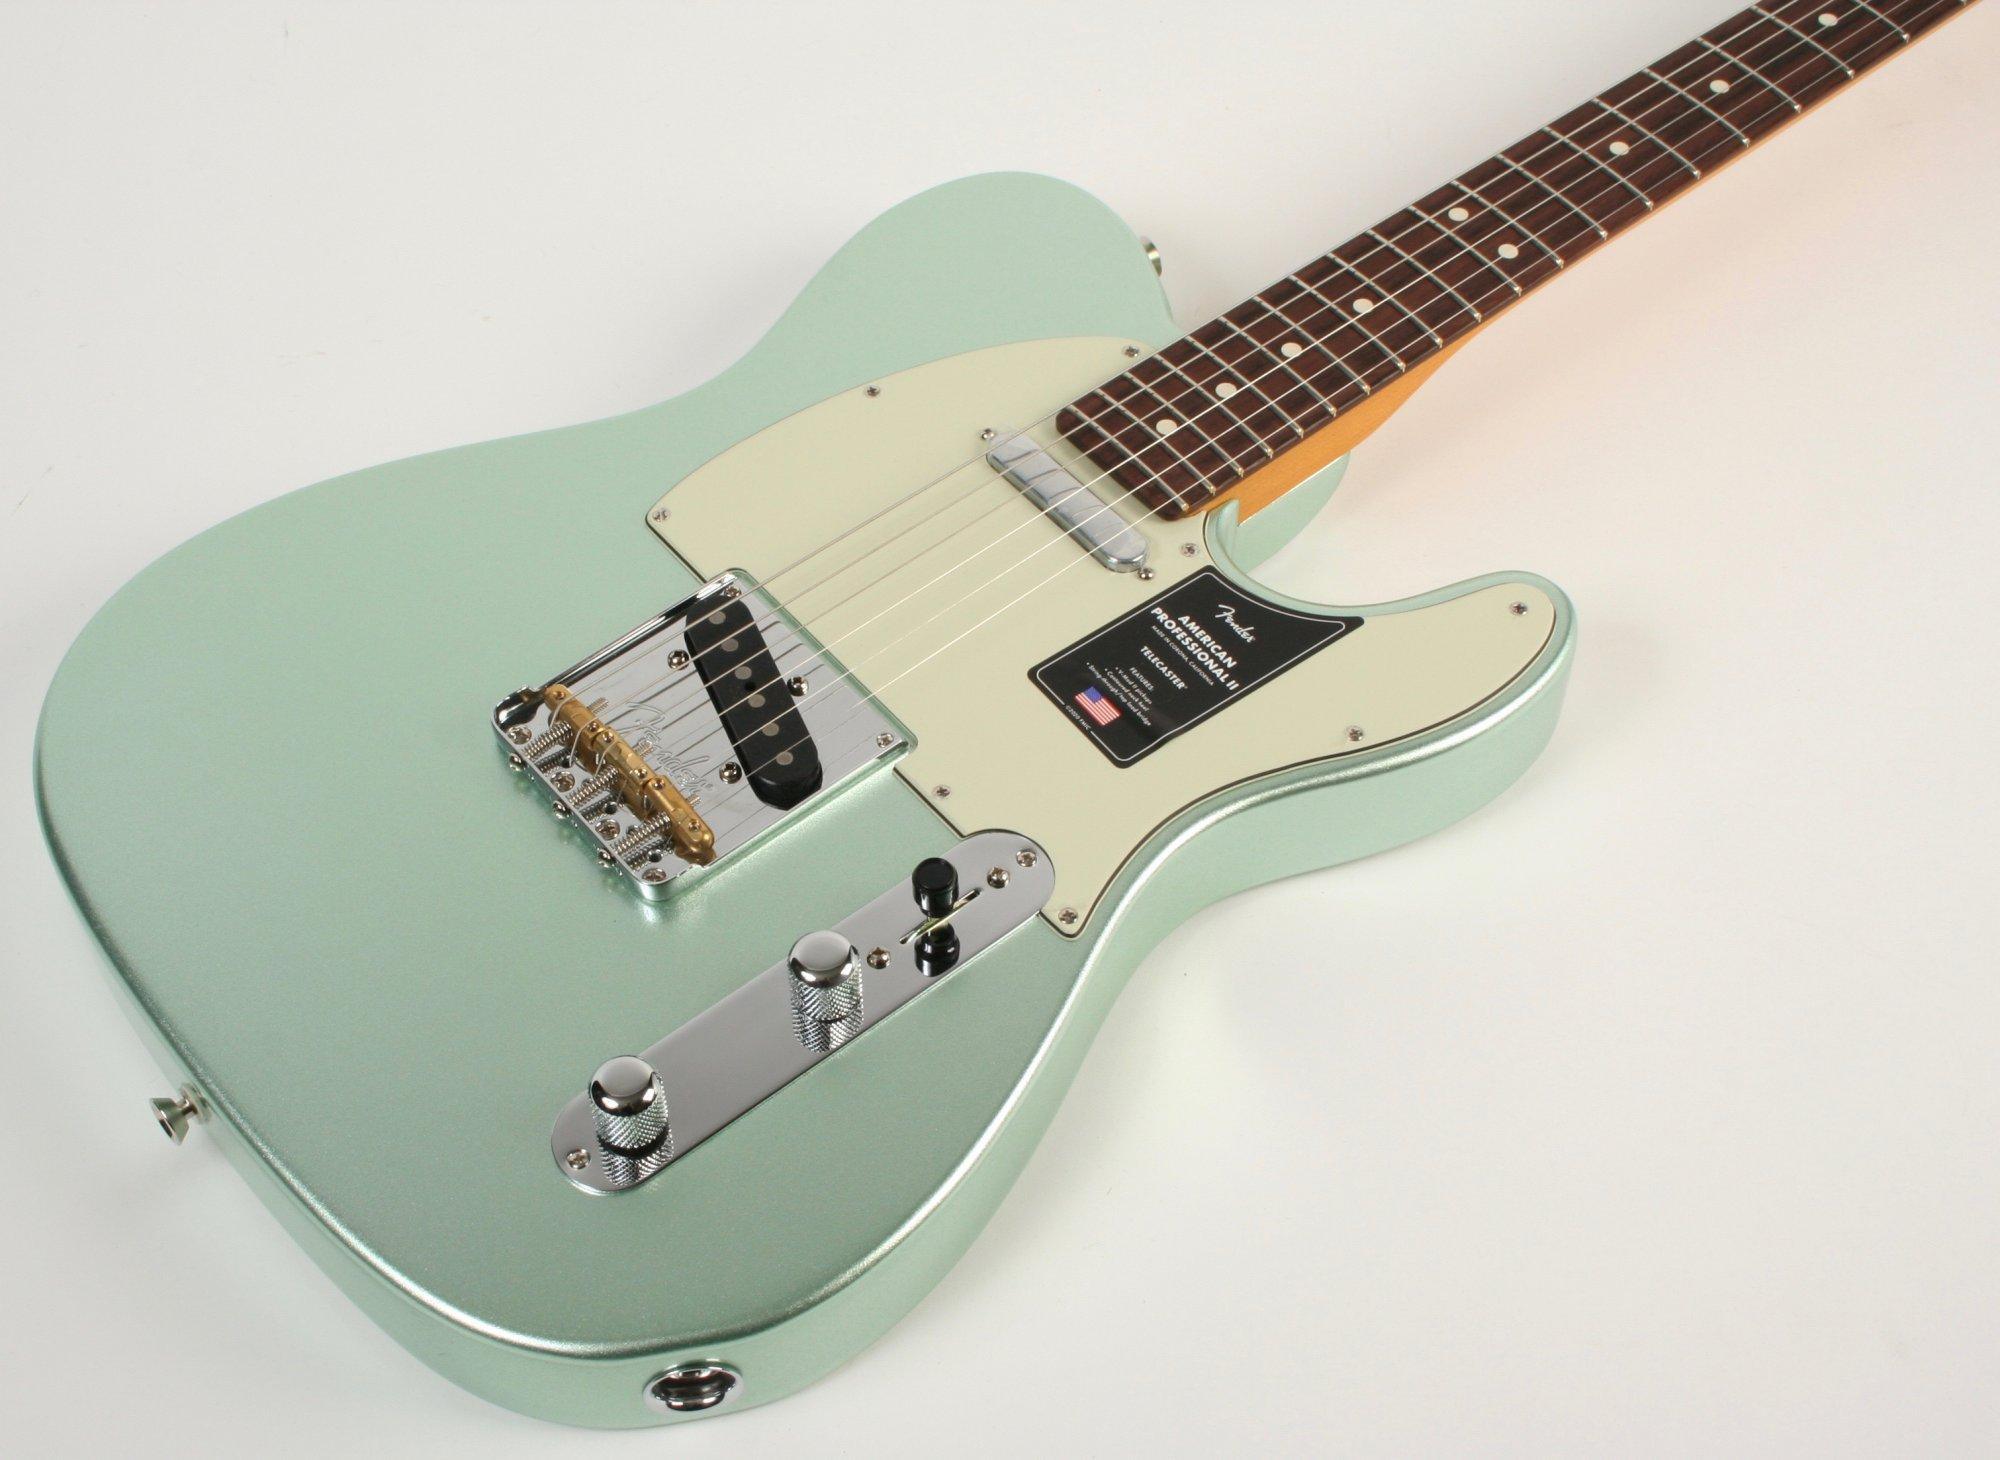 Fender American Pro II Telecaster Mystic Seafoam Green Rosewood